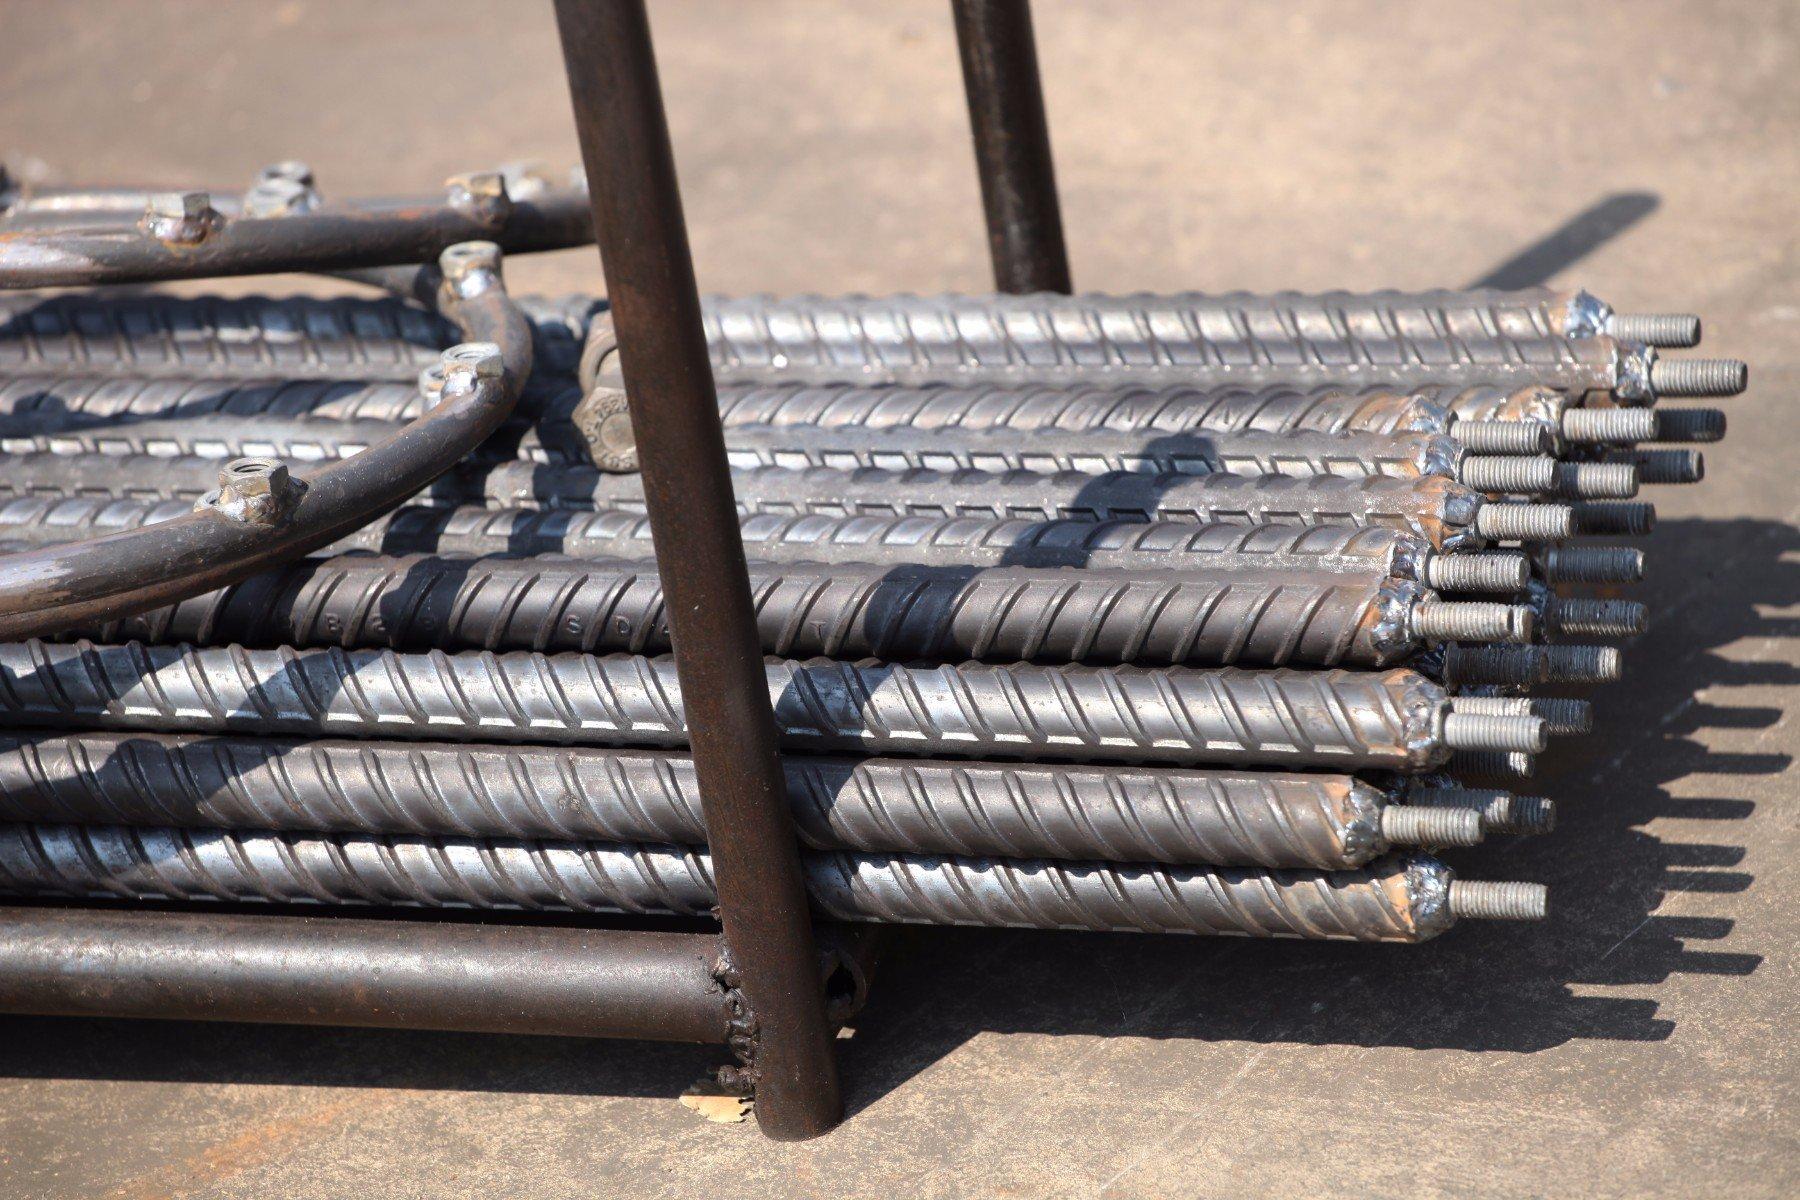 dei tubi in ferro filettati